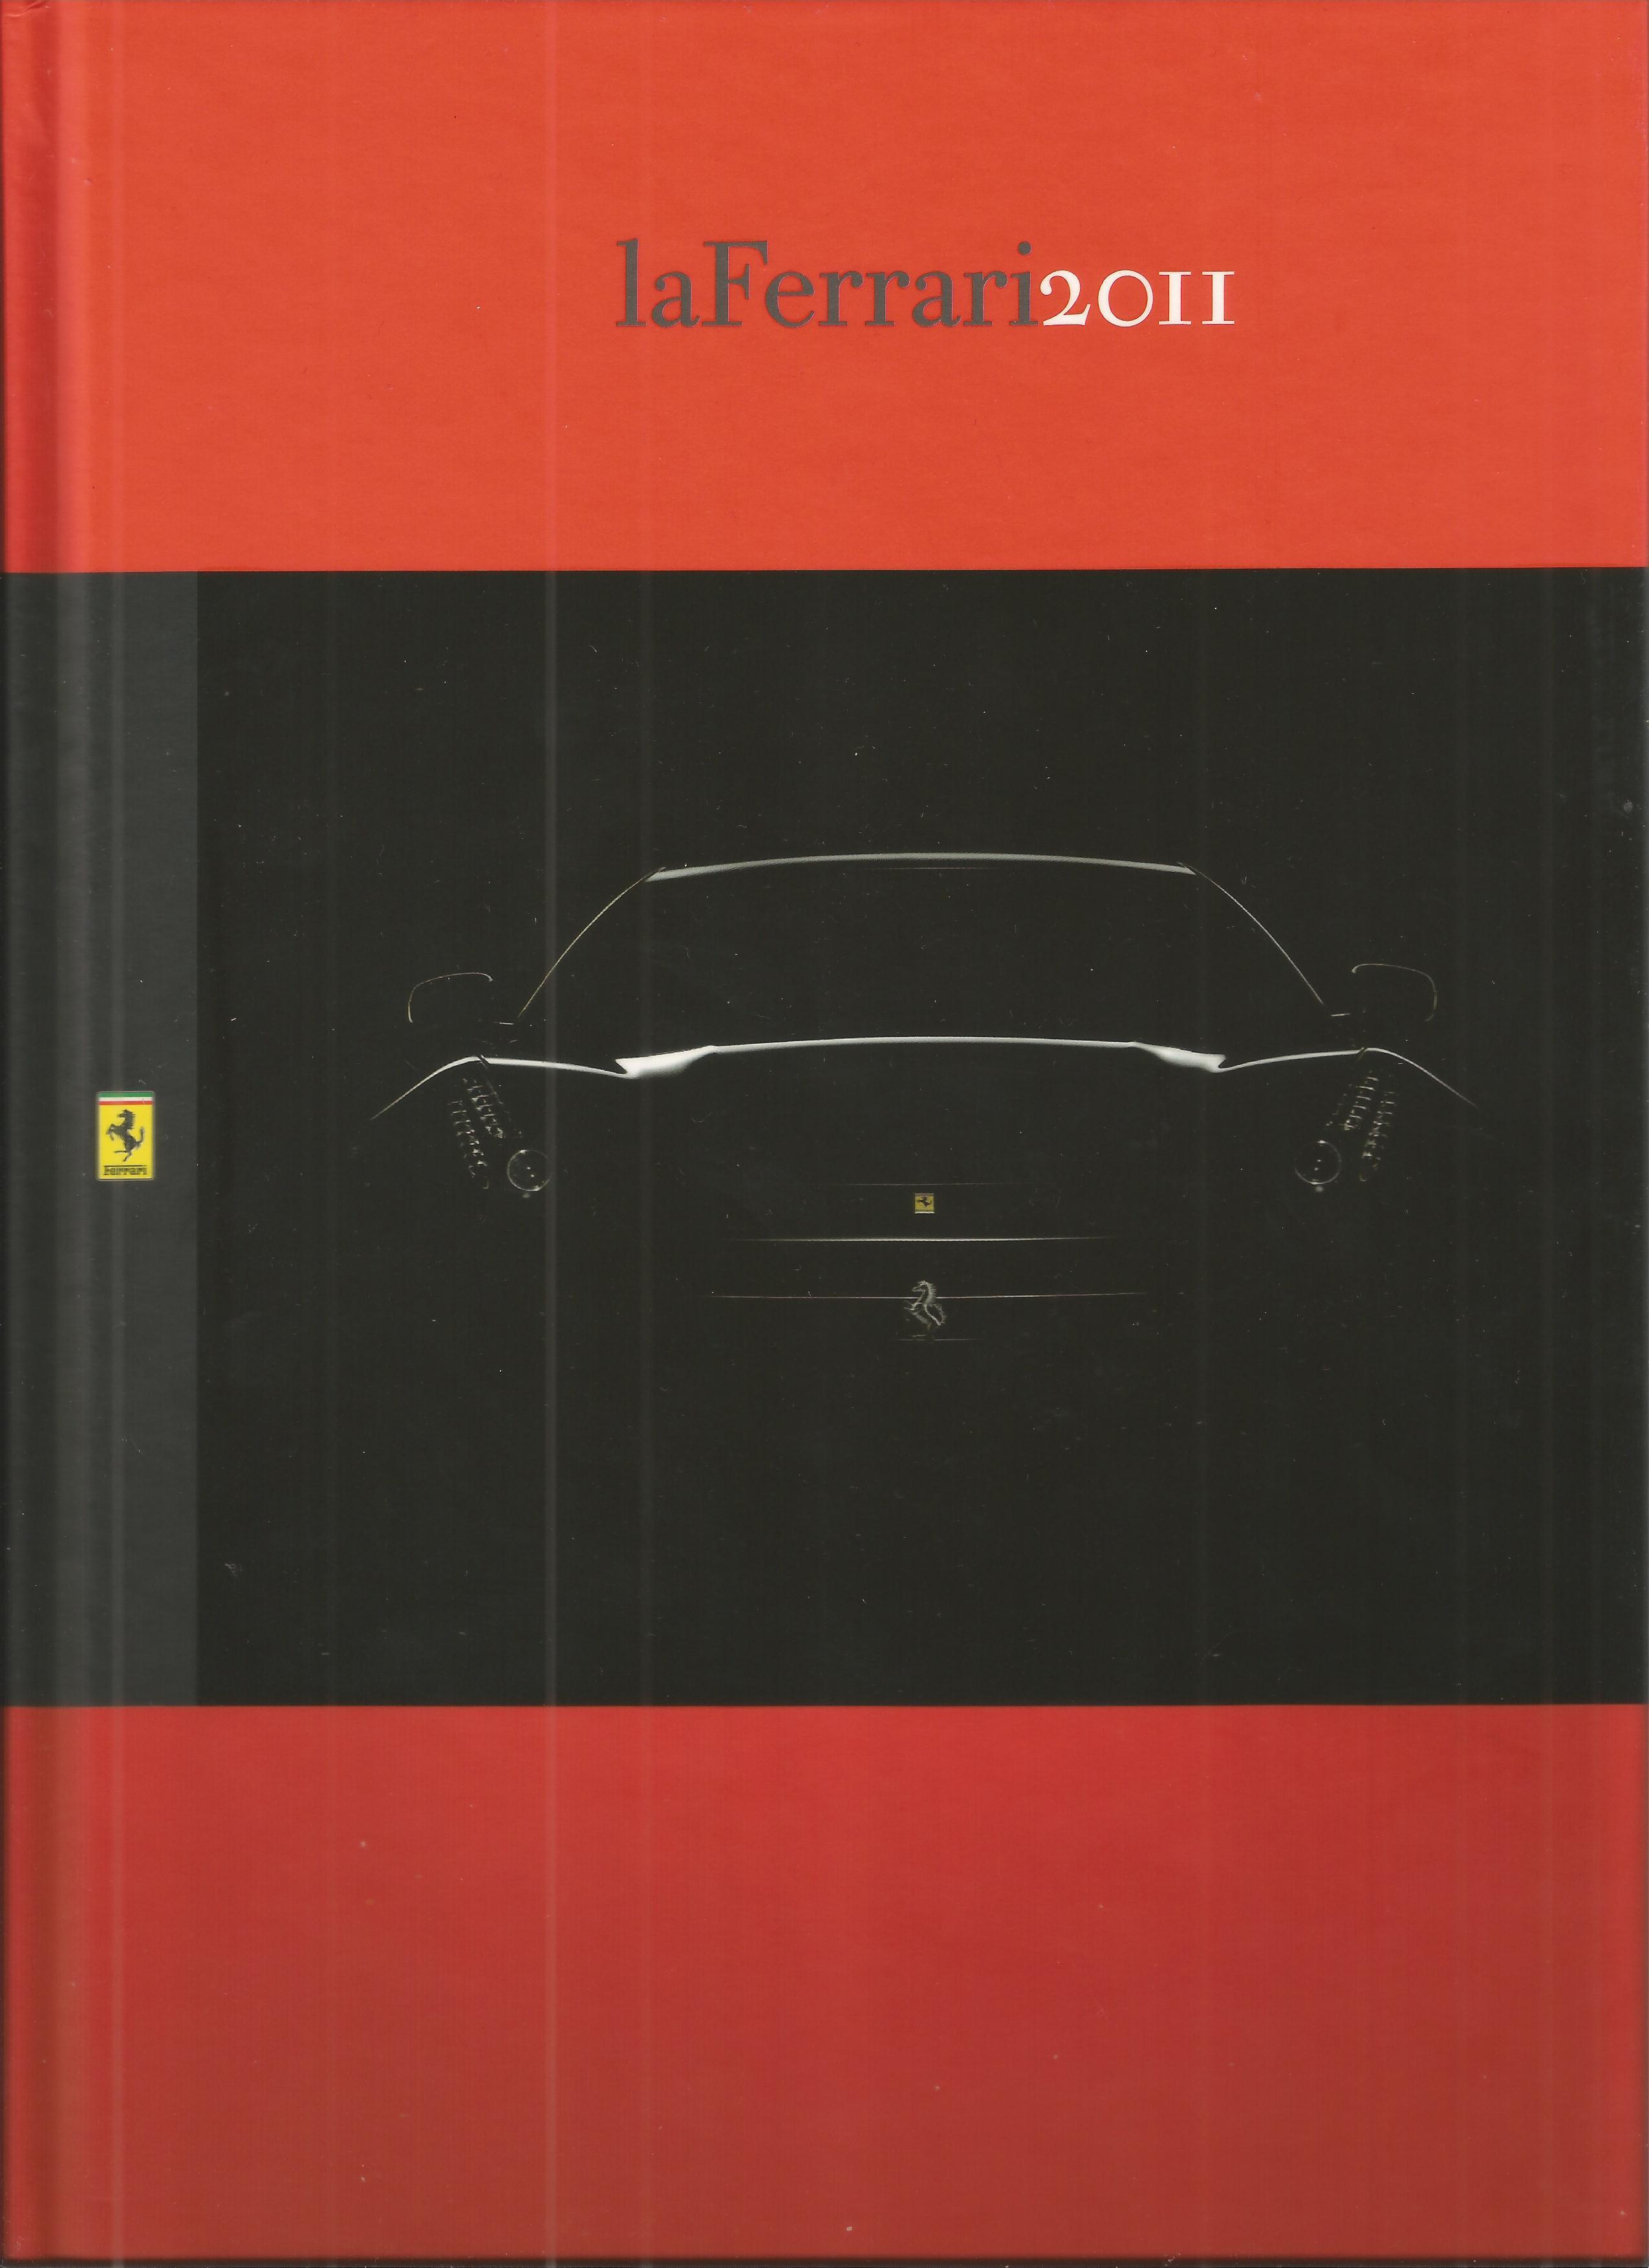 La Ferrari 2011